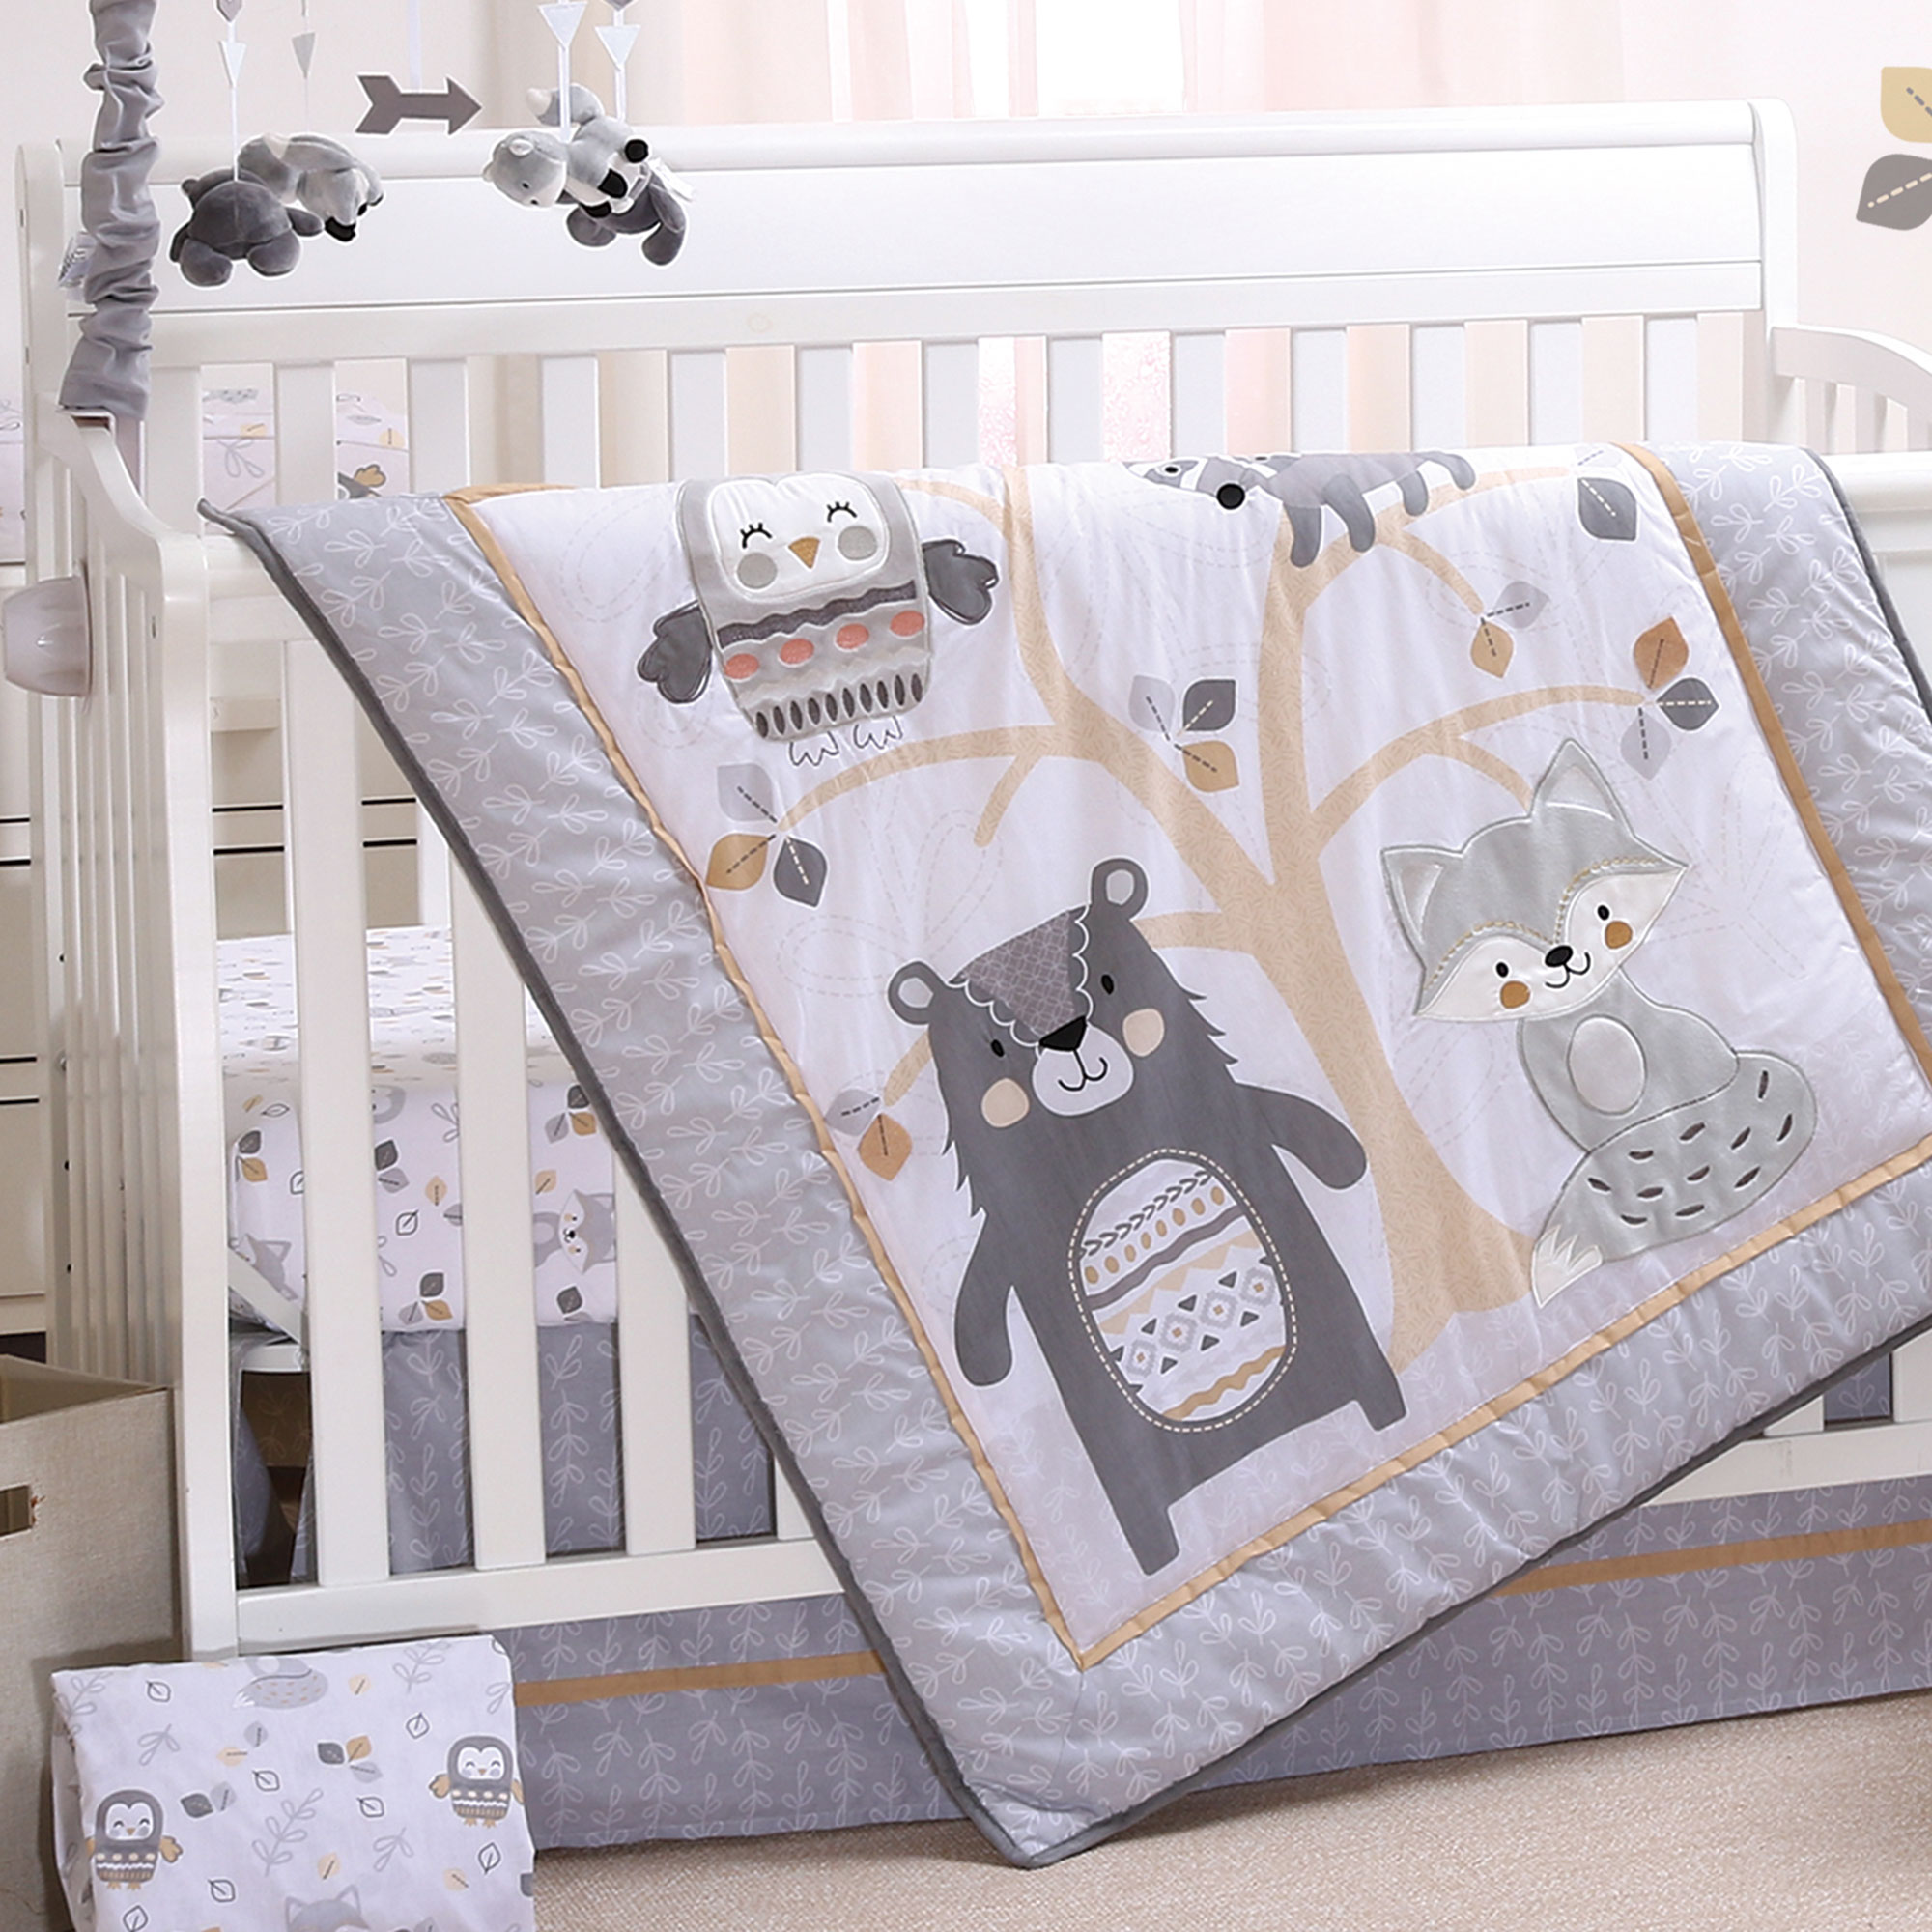 Woodland Friends 4 Piece Forest Animal Theme Baby Crib Bedding Set - Grey, Tan